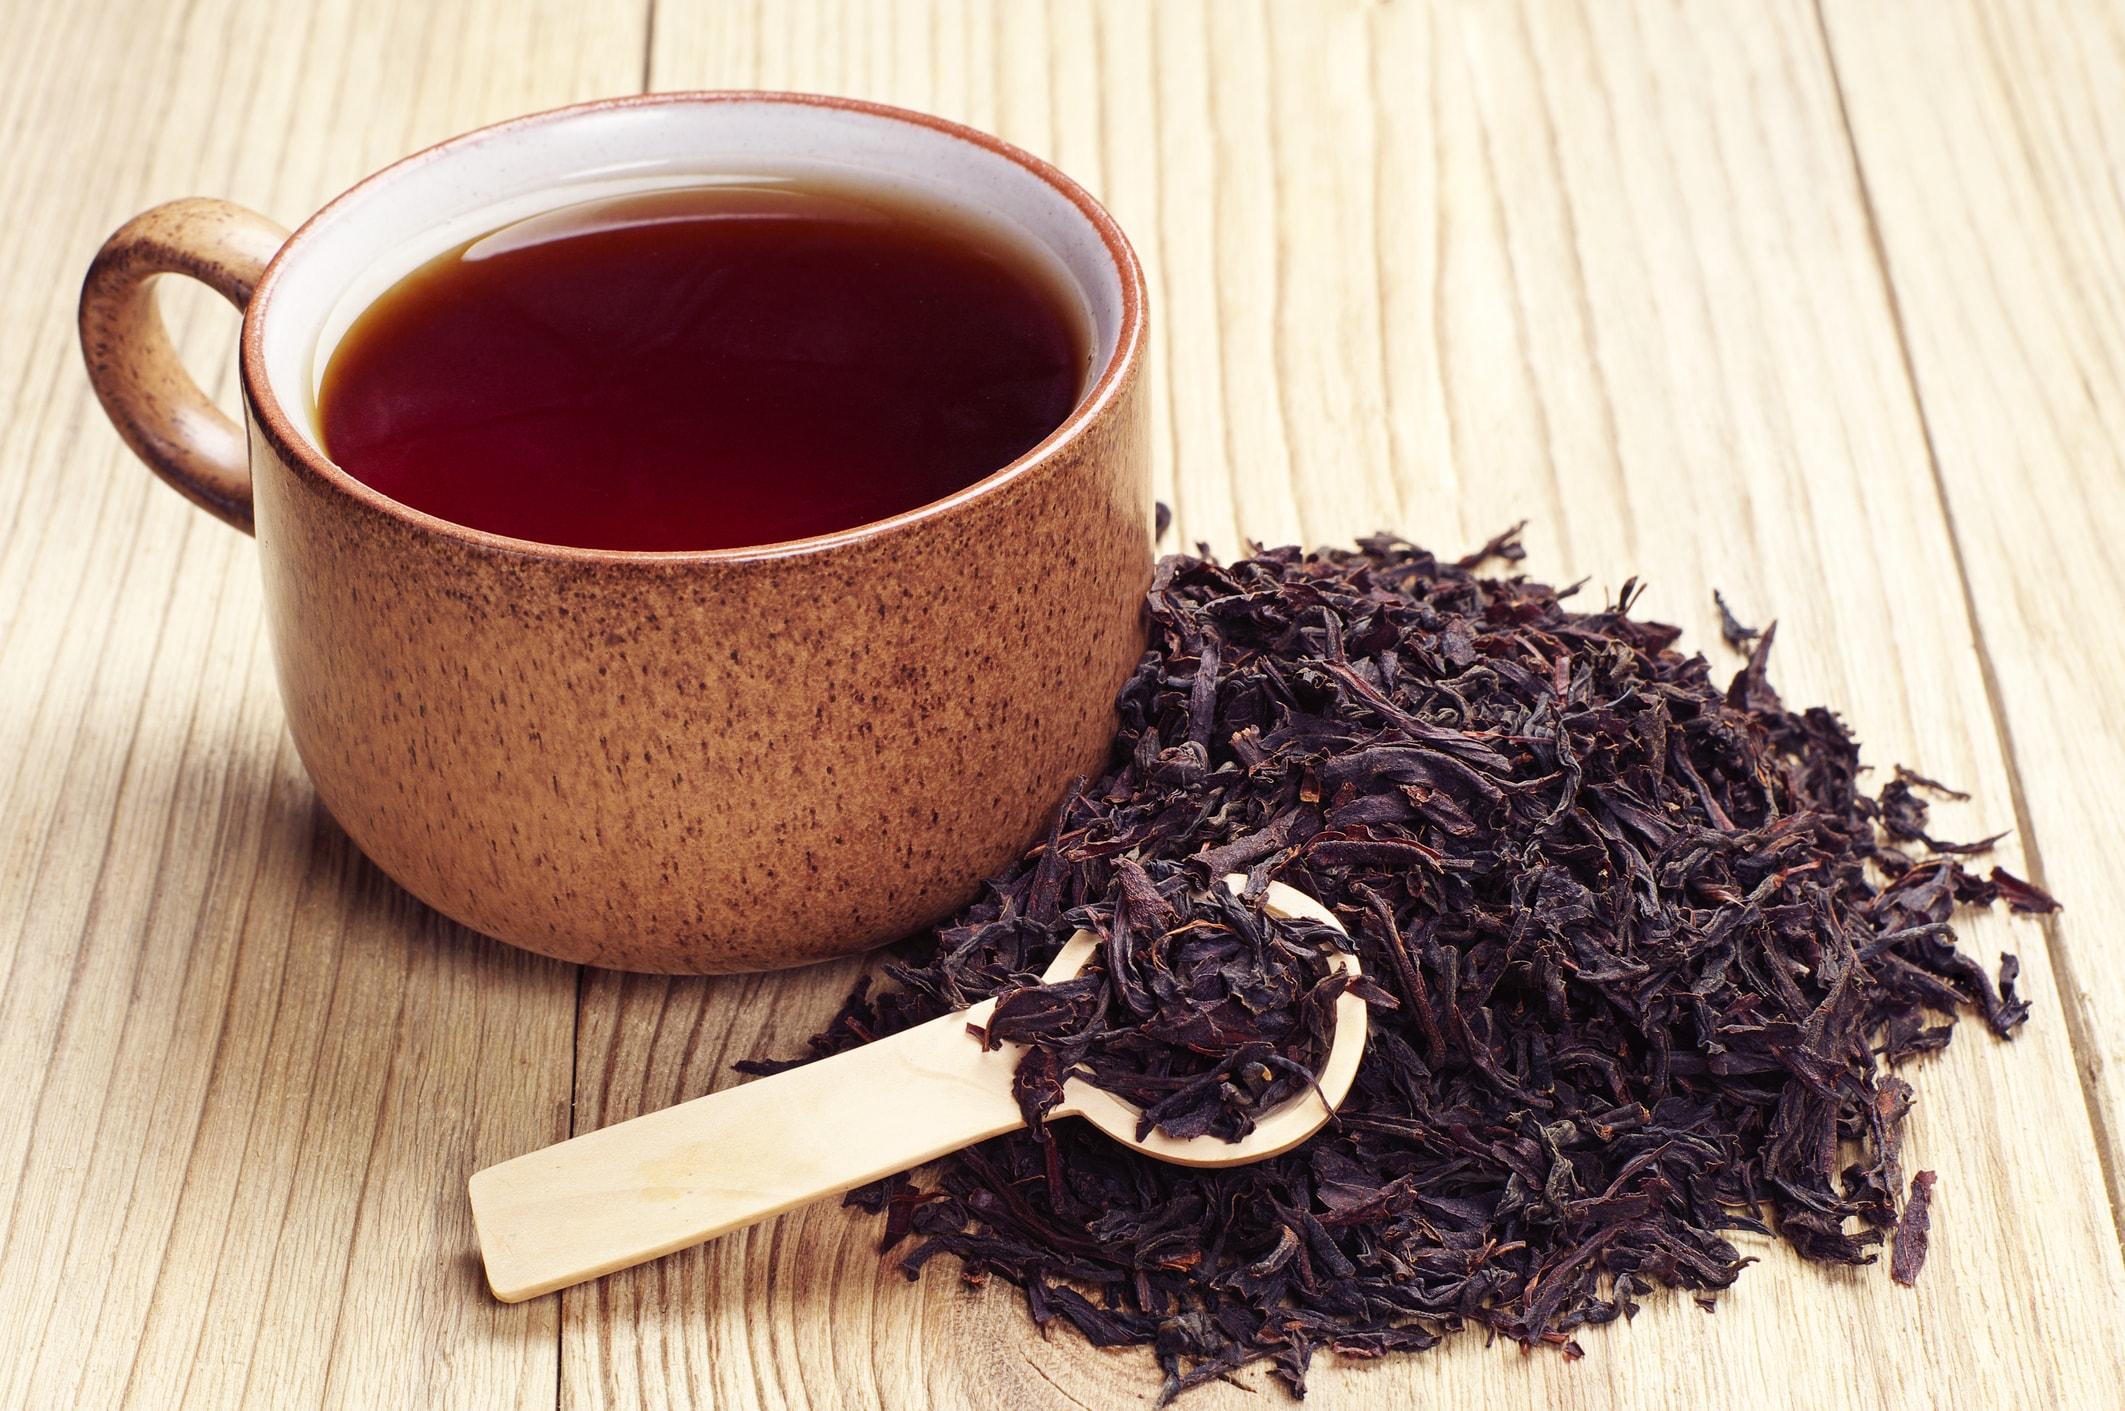 Schwarzer Tee hilft gegen kaputte Haare